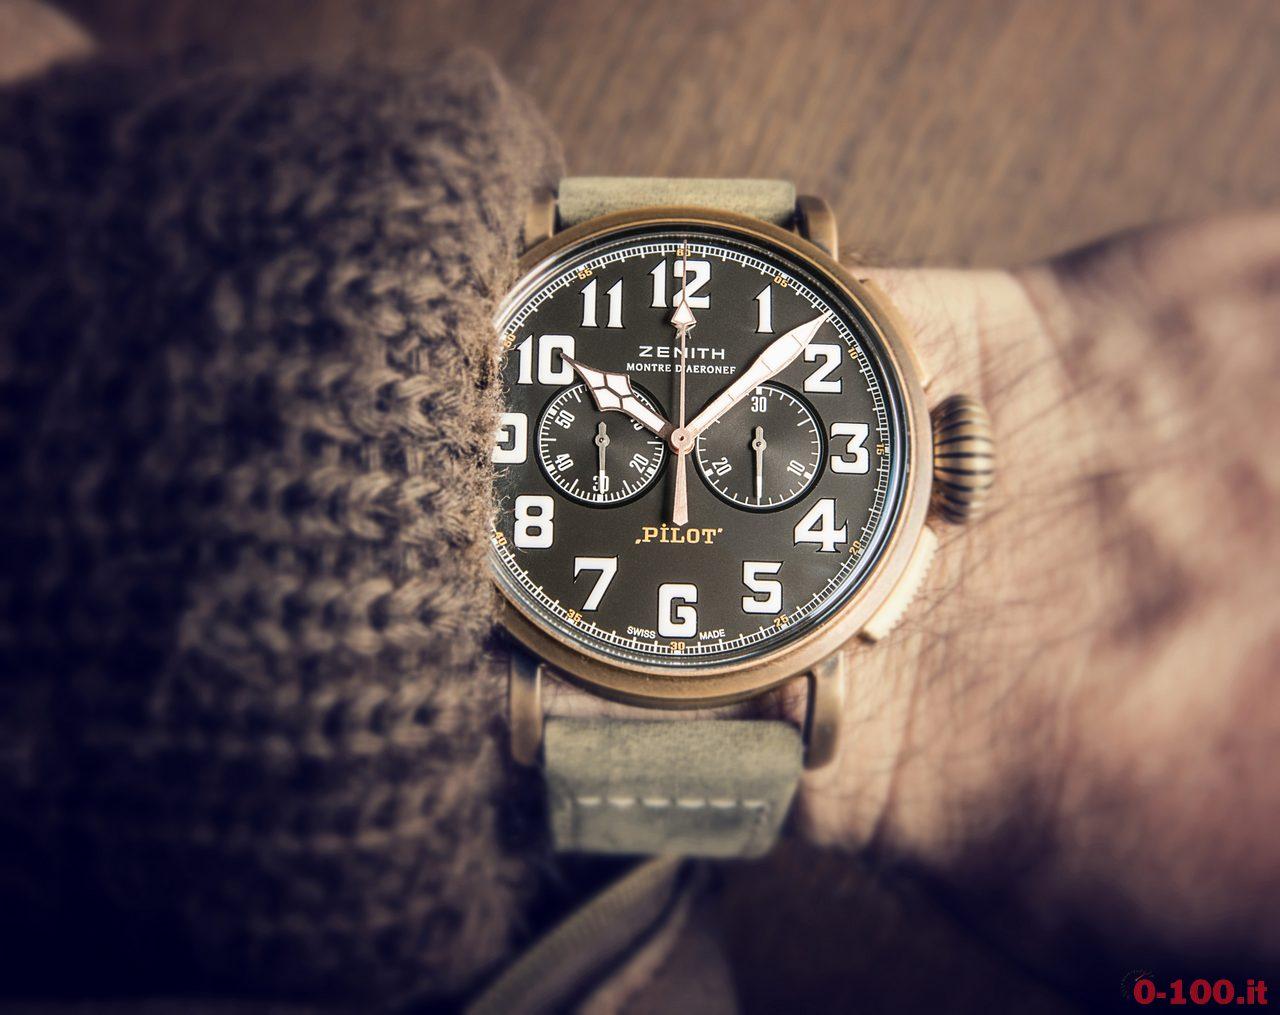 anteprima-baselworld-2017-heritage-collection-zenith-pilot-extra-special-chronograph-ref-9-2430-4069-21-c800-prezzo-price_0-10010